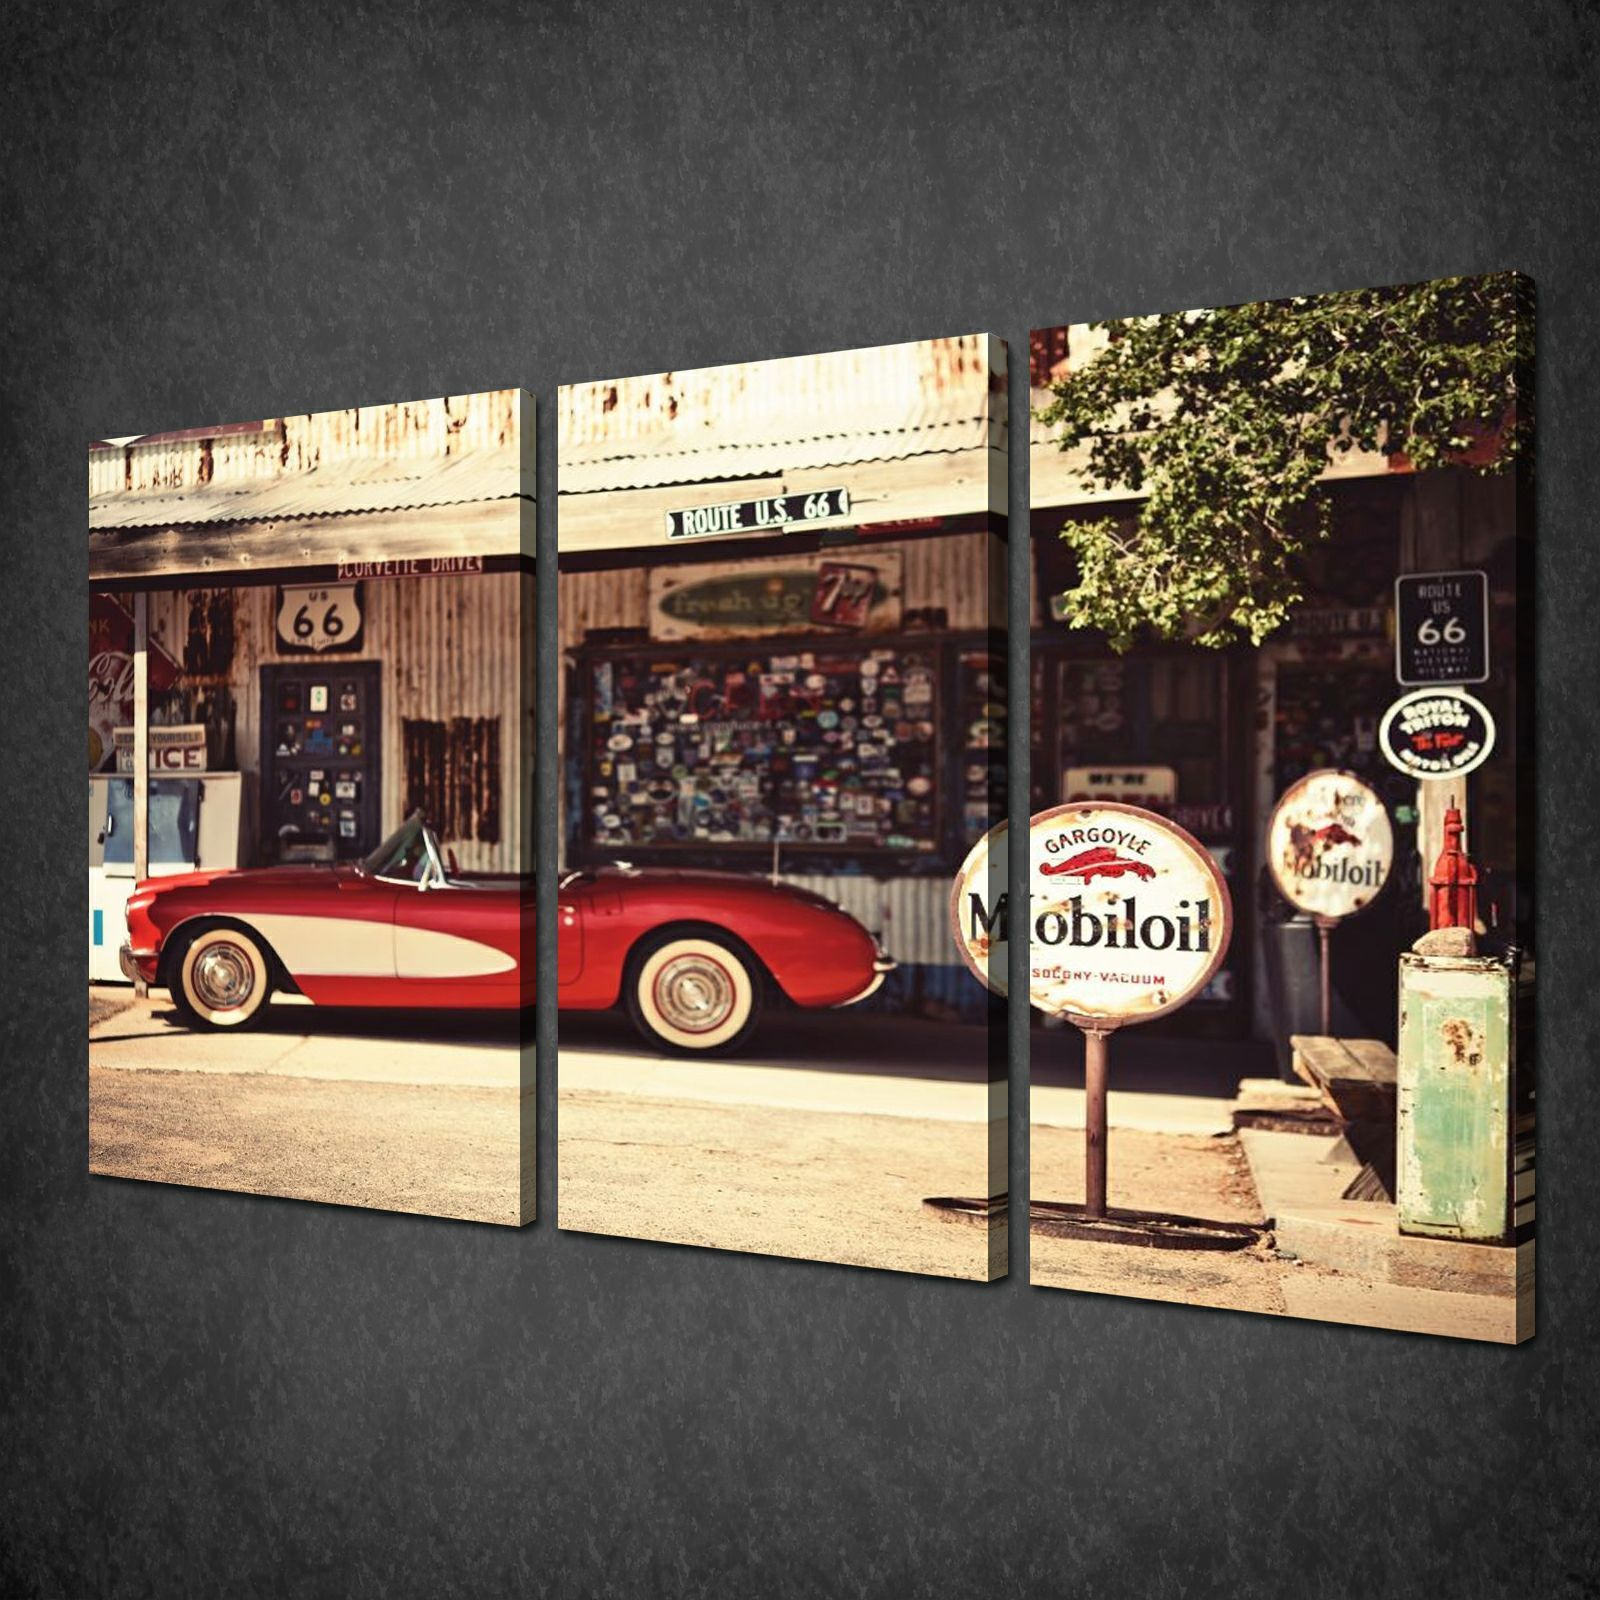 Canvas print pictures high quality handmade free next for Antique car decor